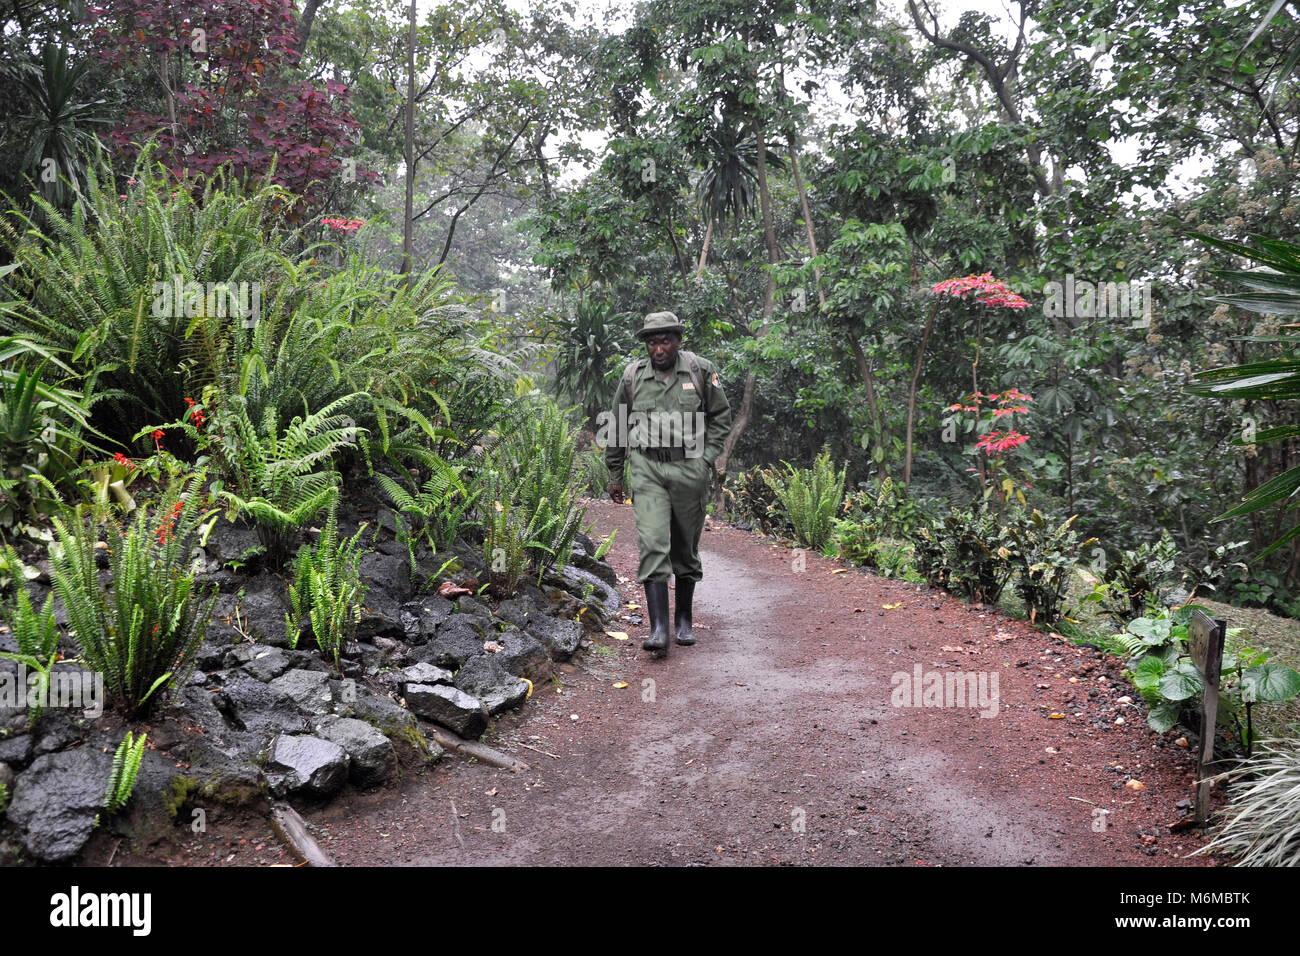 Democratic Republic of Congo, Virunga National Park - Stock Image